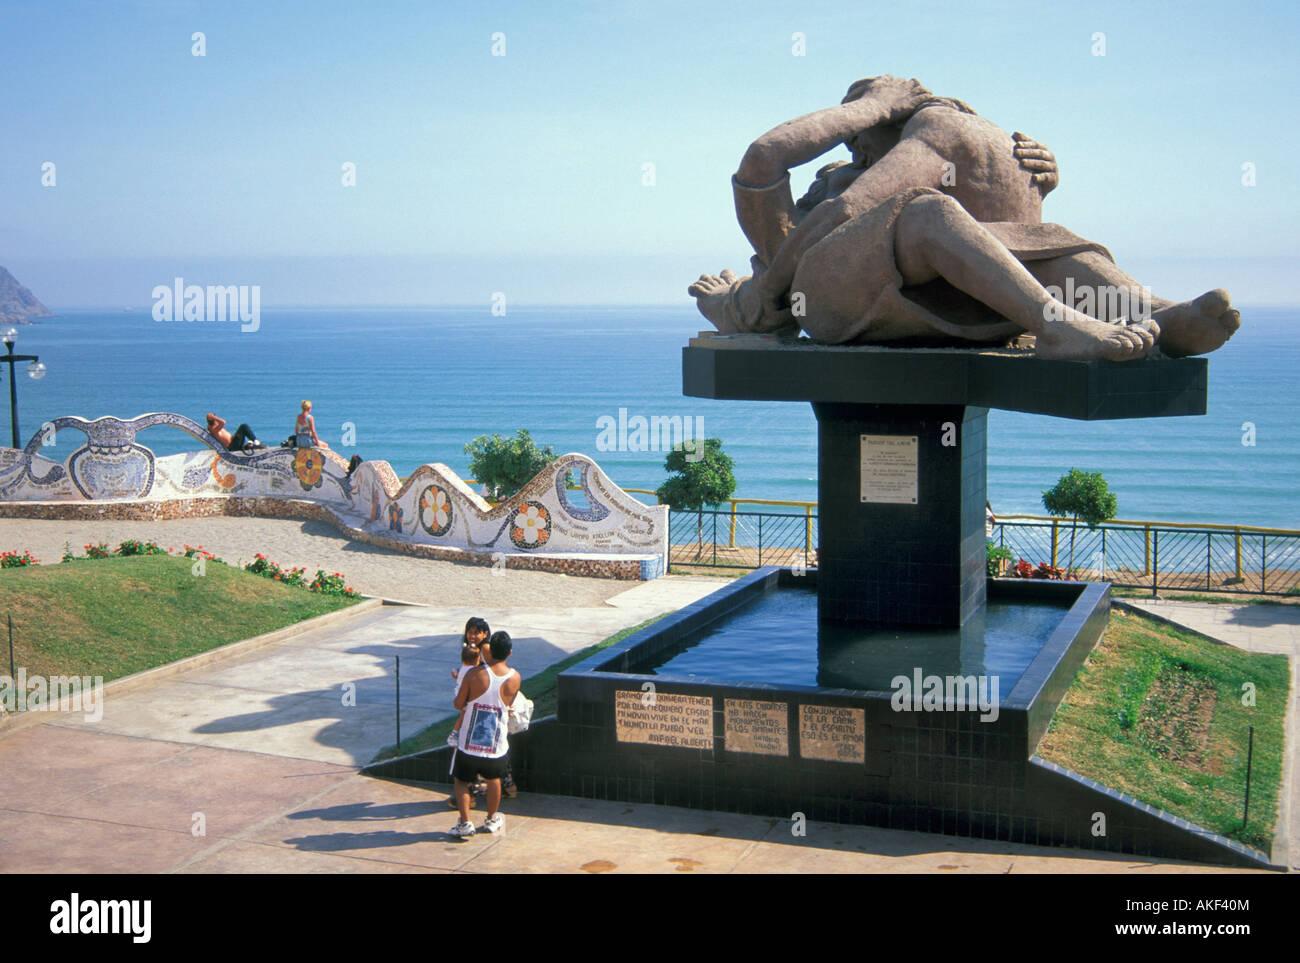 Miraflores: el parque del amor, Lima, Perú. Foto de stock